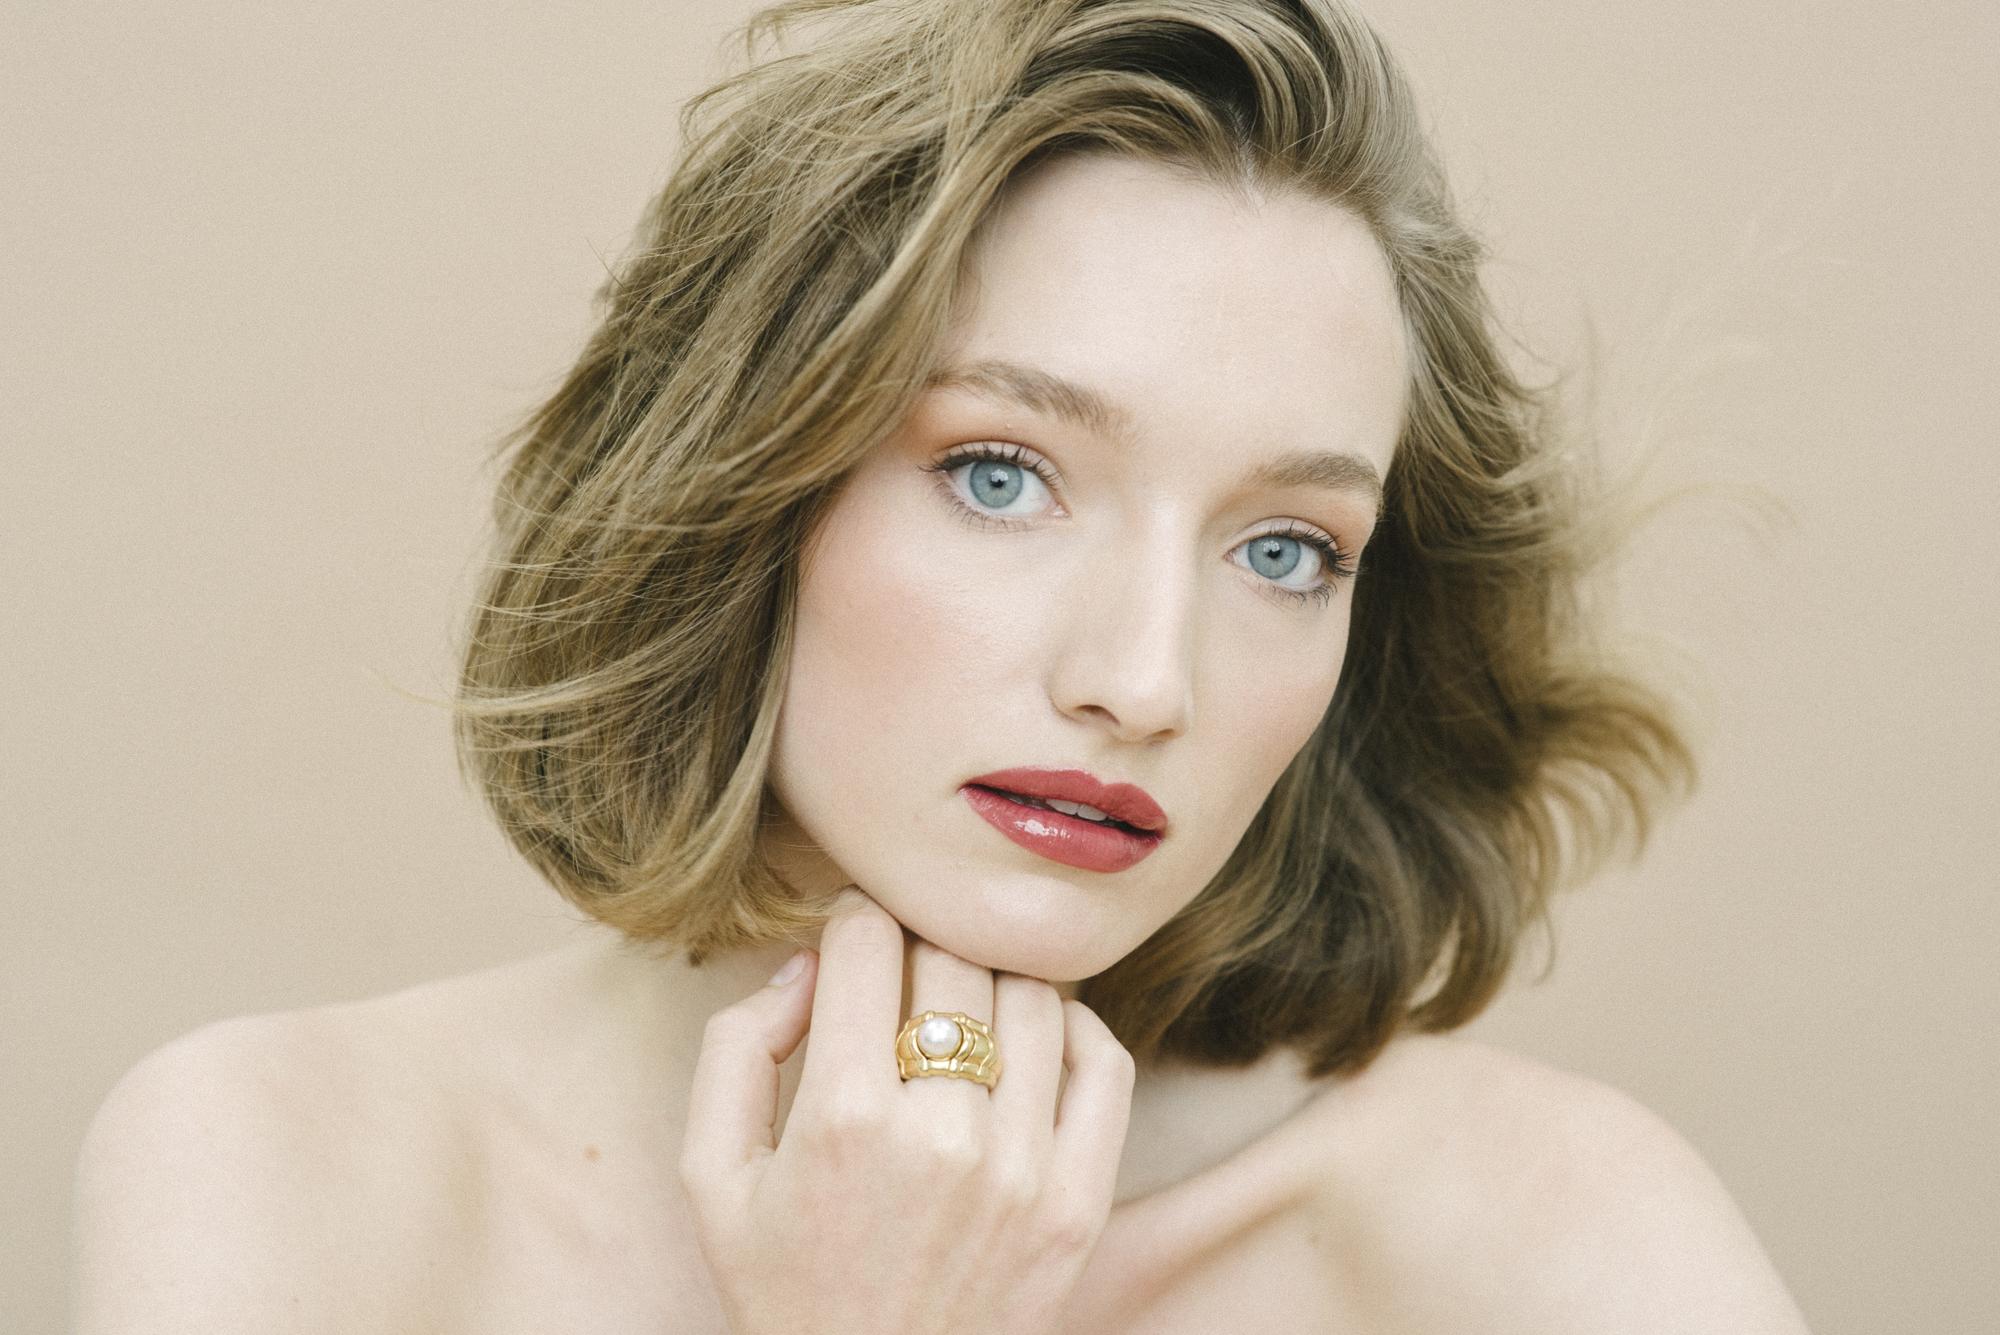 AW19 Beauty Looks // www.oliviabossert.com // London Based Fashion and Beauty Photographer